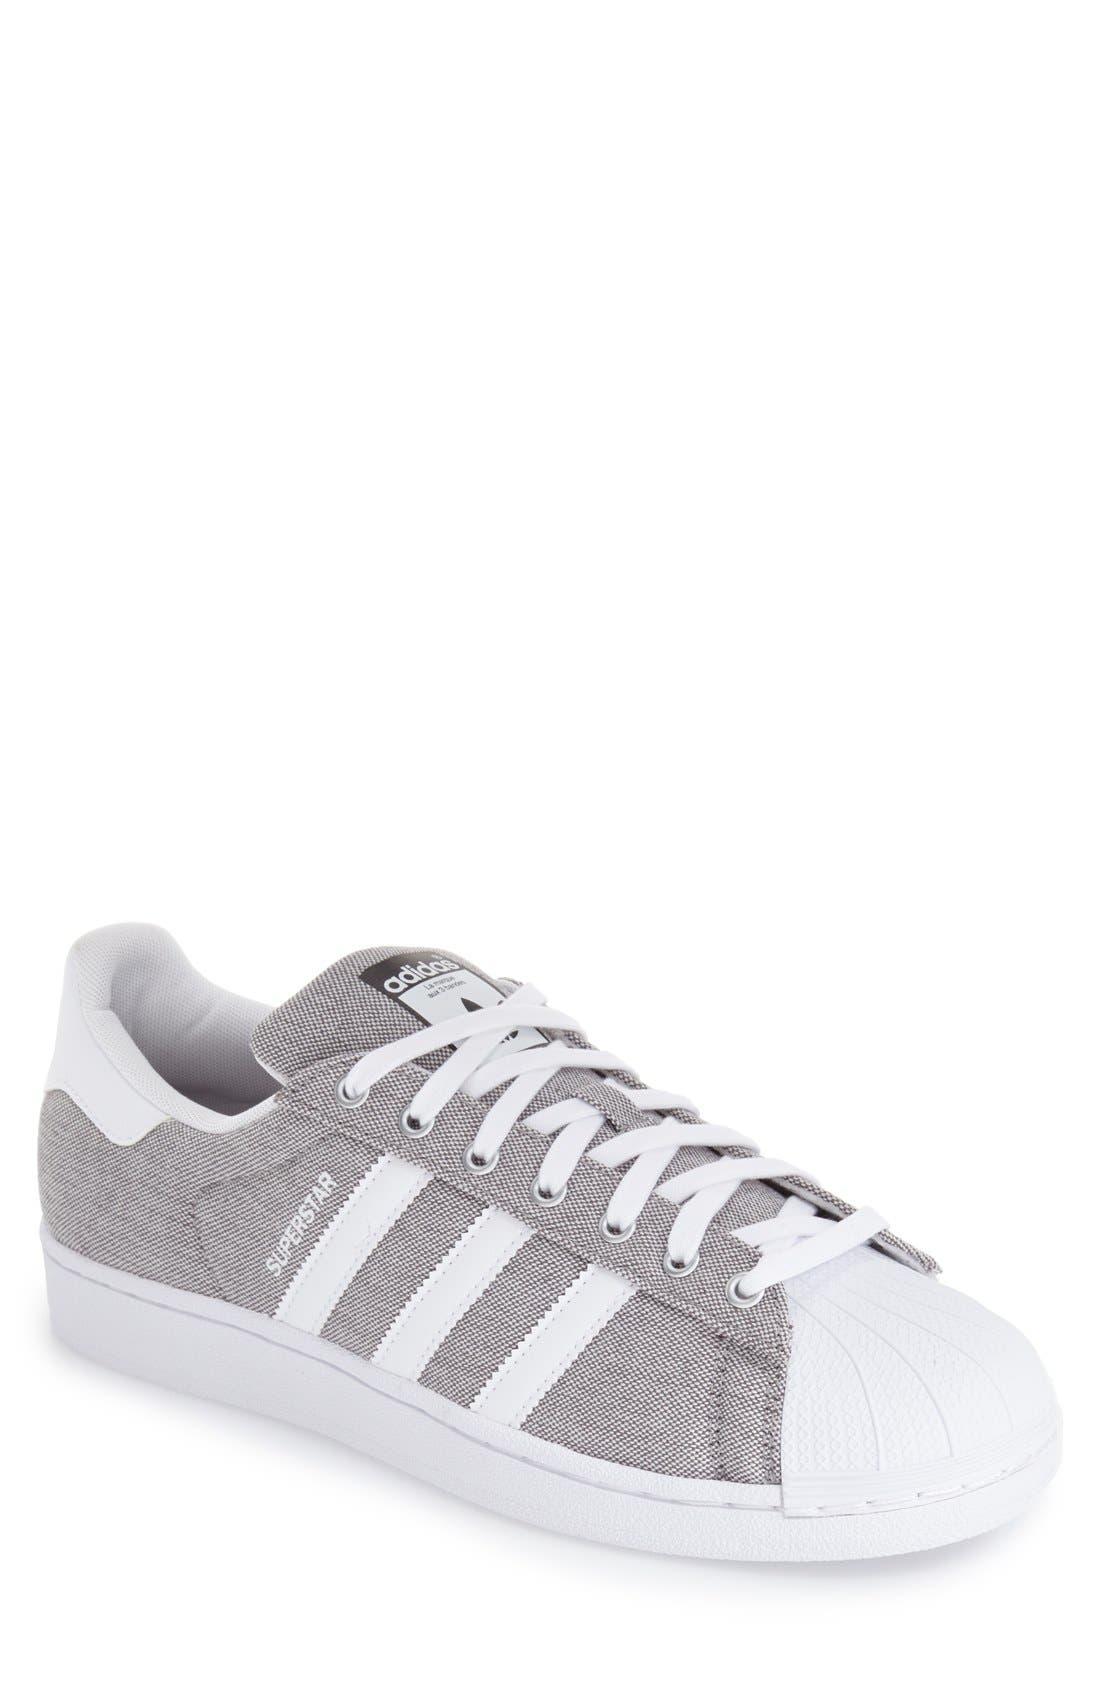 Superstar Sneaker,                             Main thumbnail 5, color,